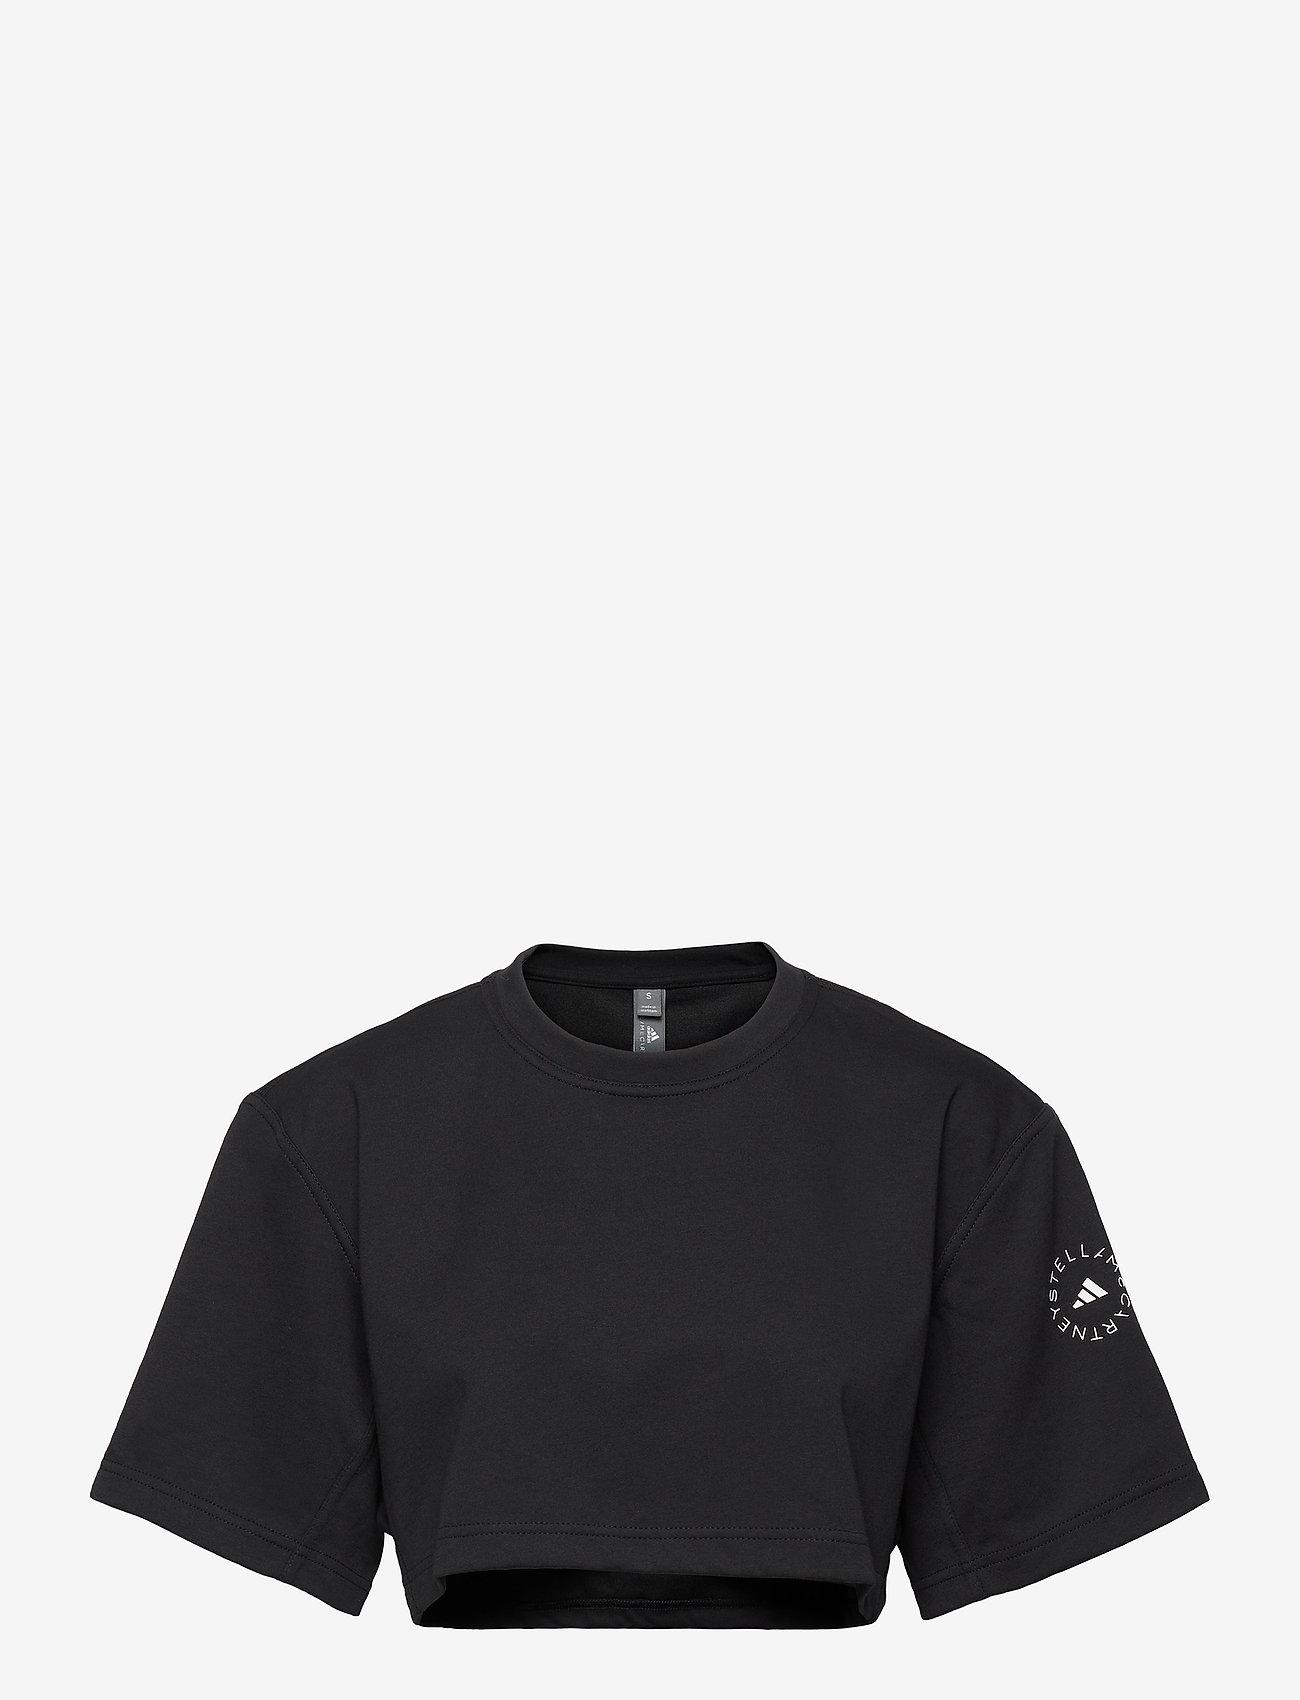 adidas by Stella McCartney - Future Playground Cropped T-Shirt W - toppe og t-shirts - black - 1